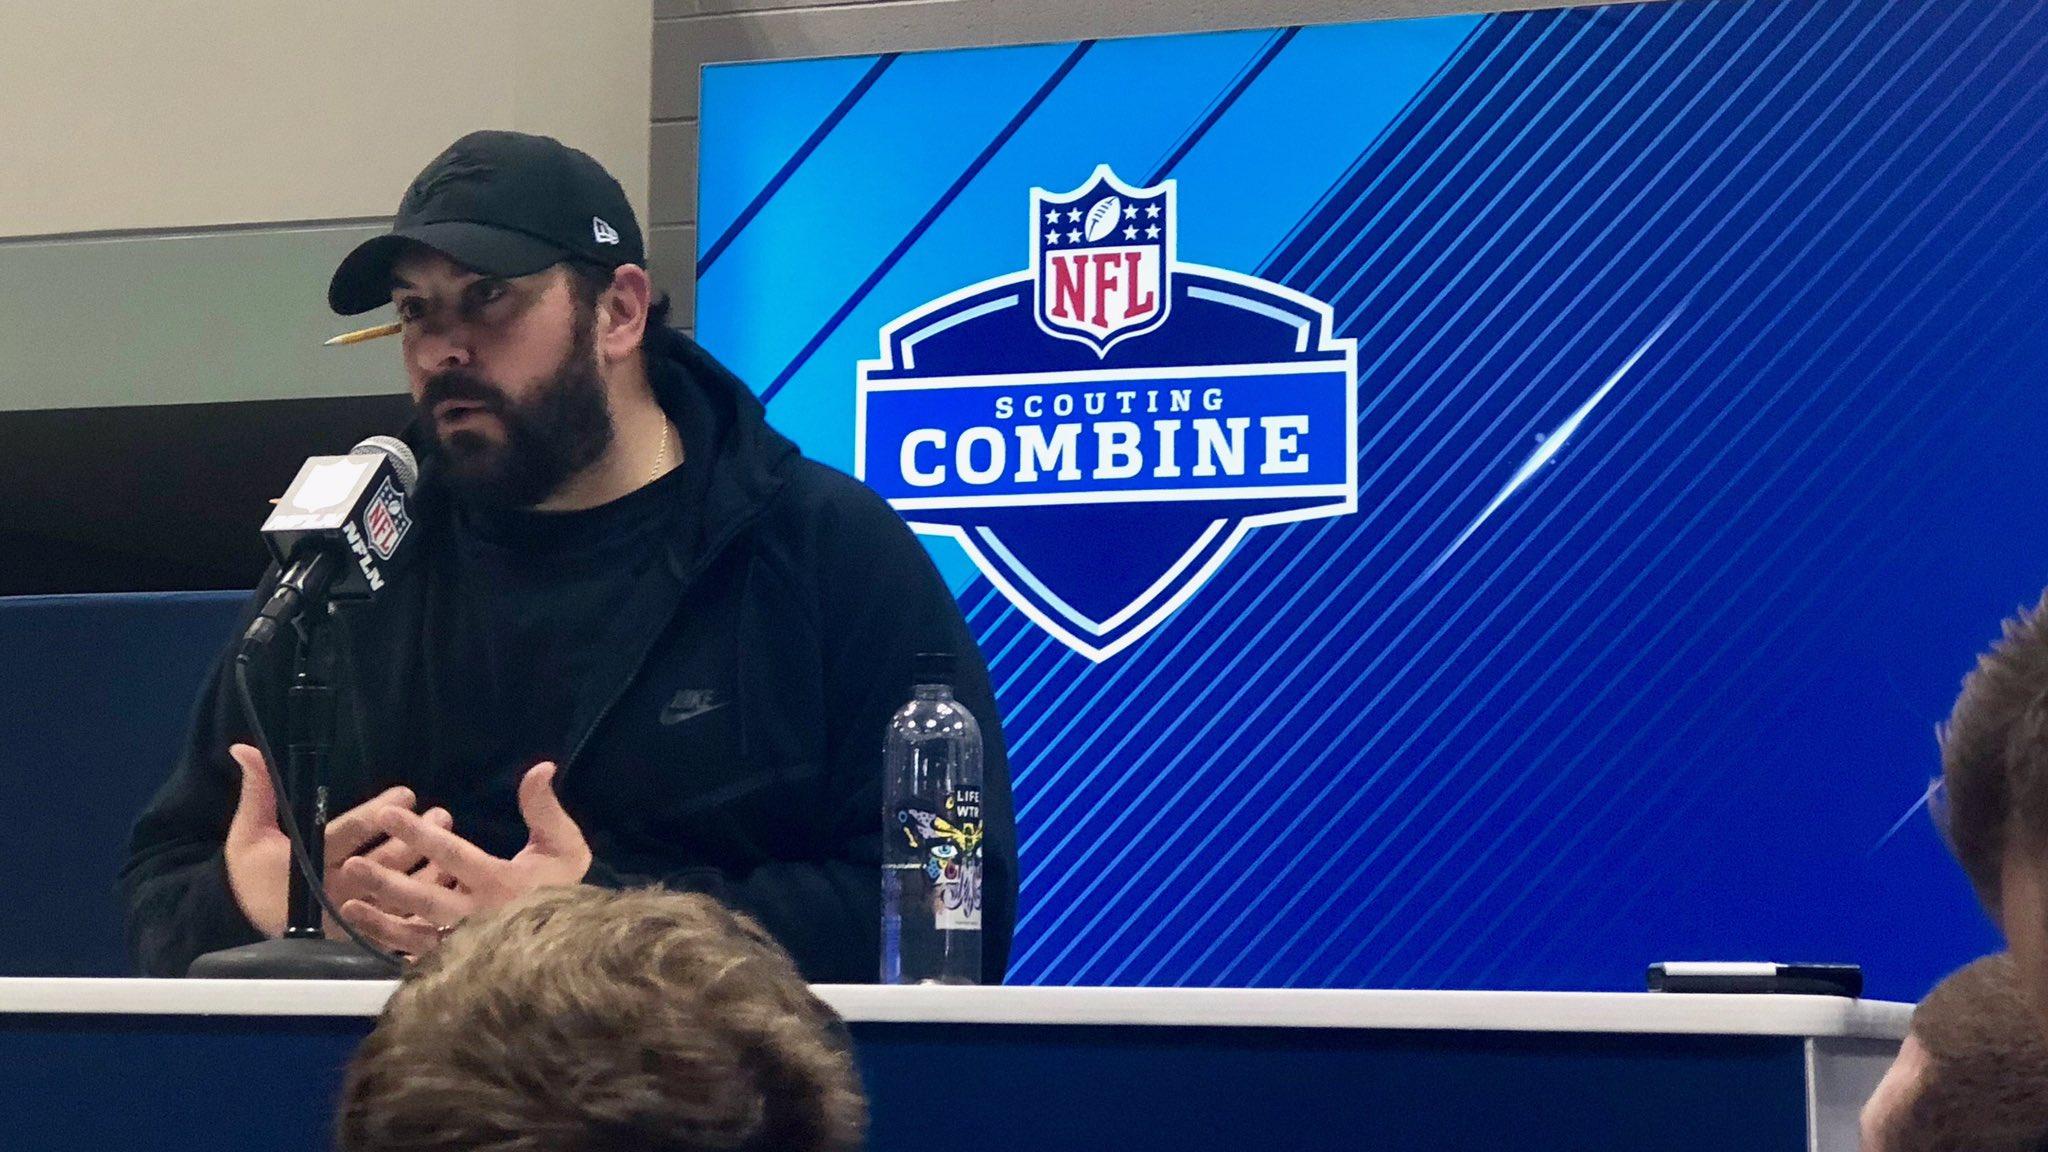 Hey Matty P!   #NFLCombine https://t.co/KfkkSatlJe